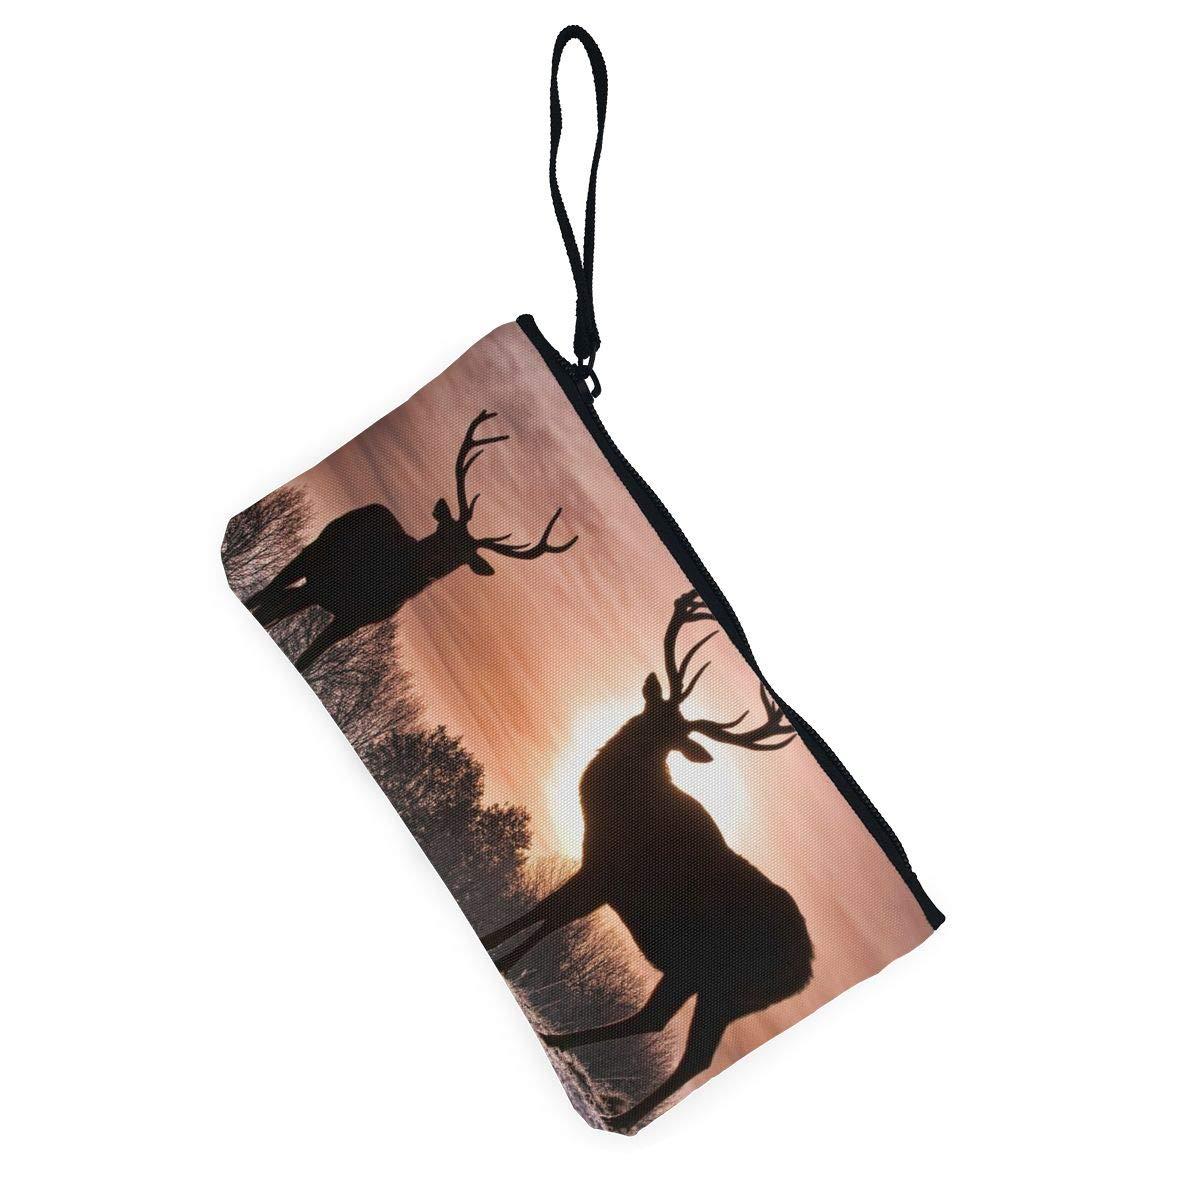 YUANSHAN Sunset Deer Unisex Canvas Coin Purse Change Cash Bag Zipper Small Purse Wallets with Handle